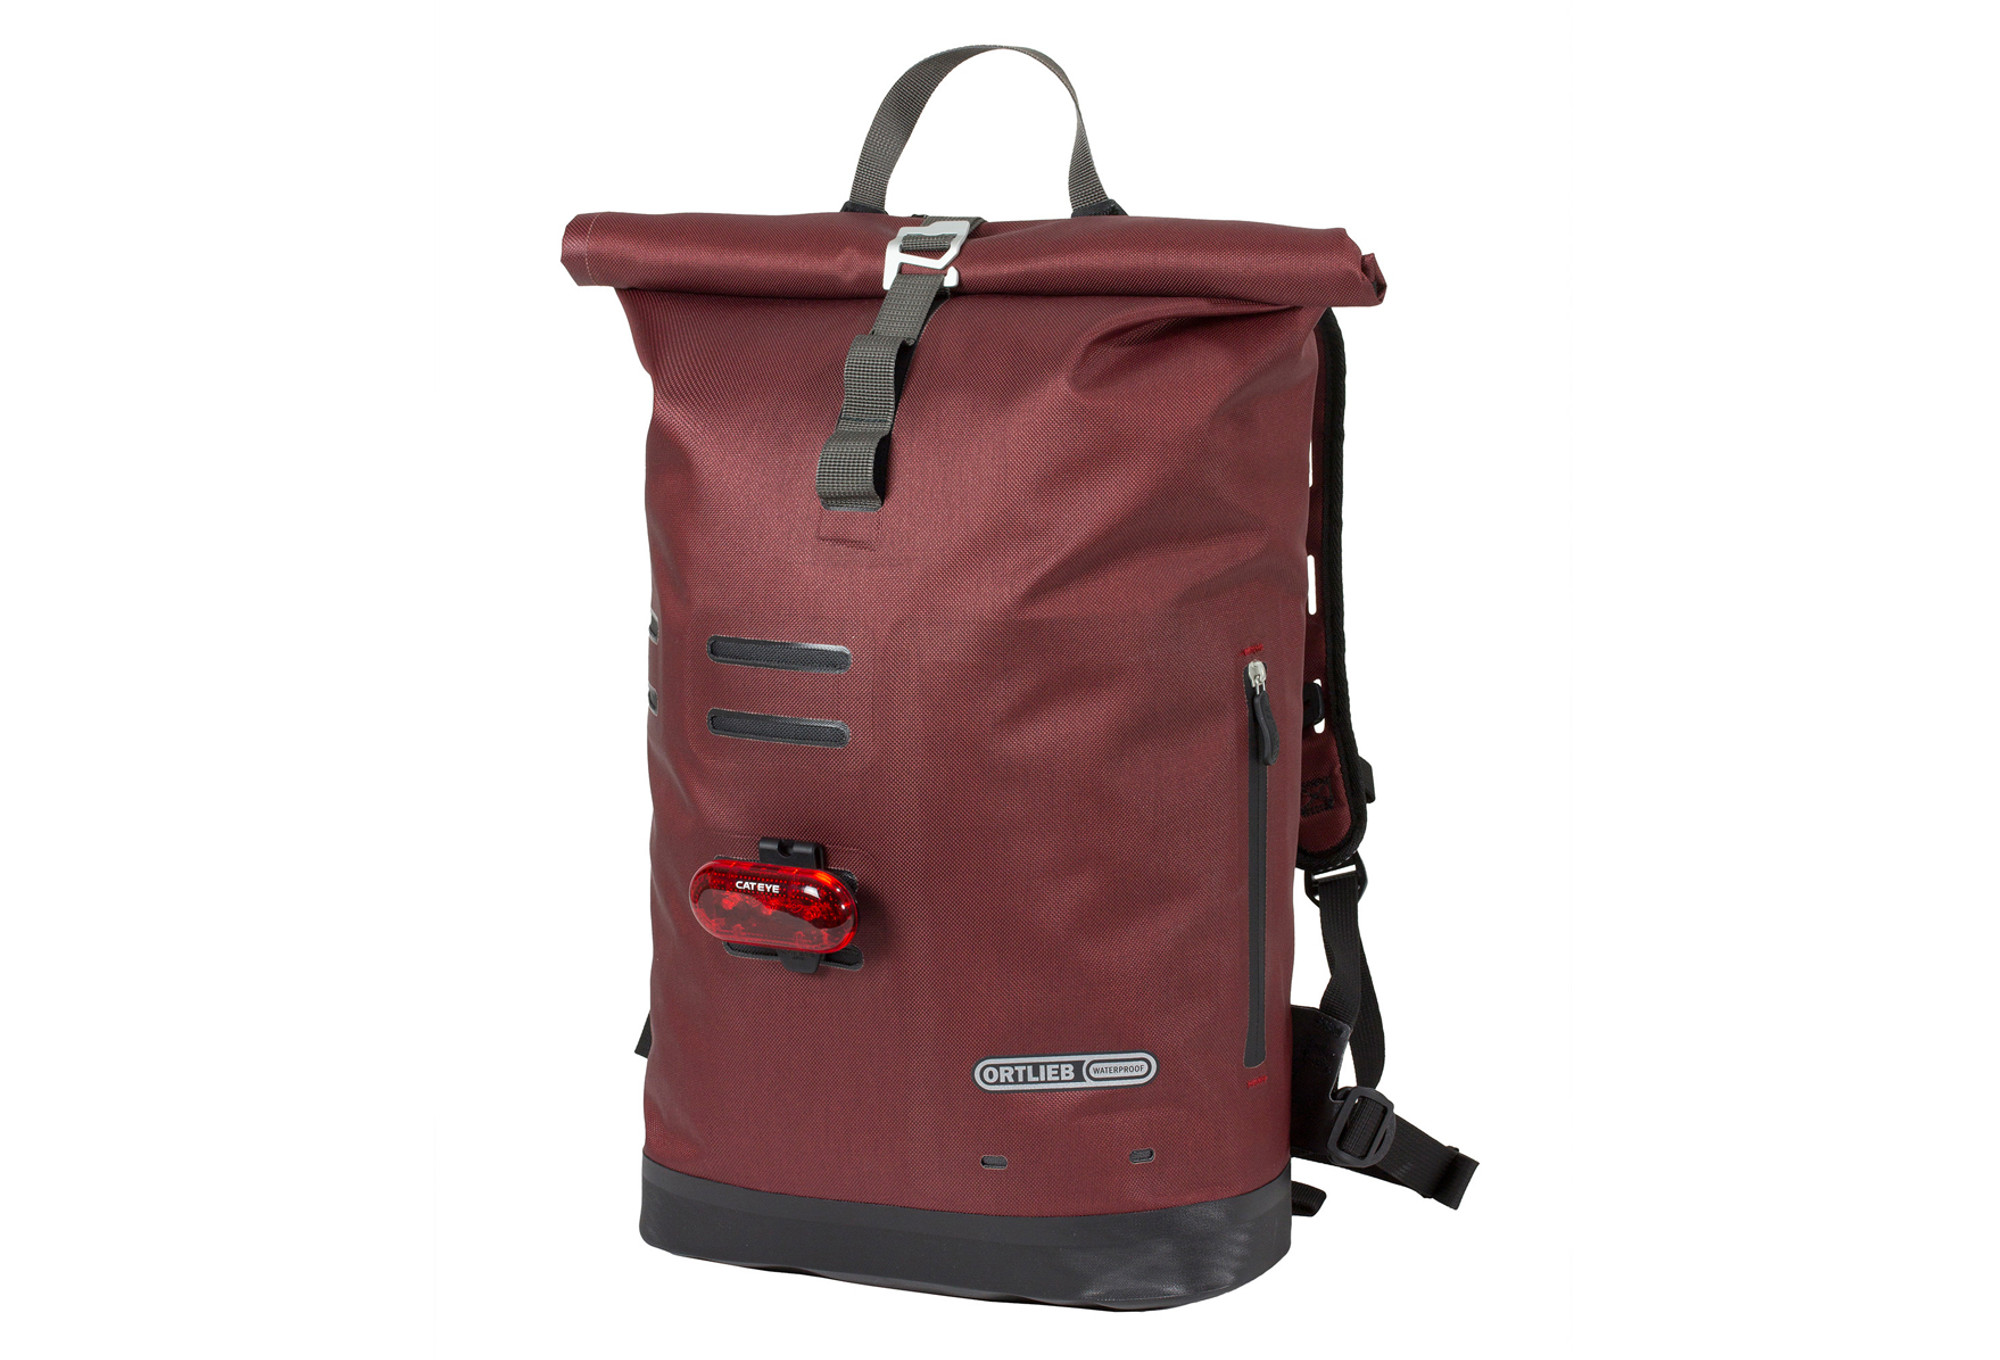 ortlieb back pack commuter daypack city red. Black Bedroom Furniture Sets. Home Design Ideas